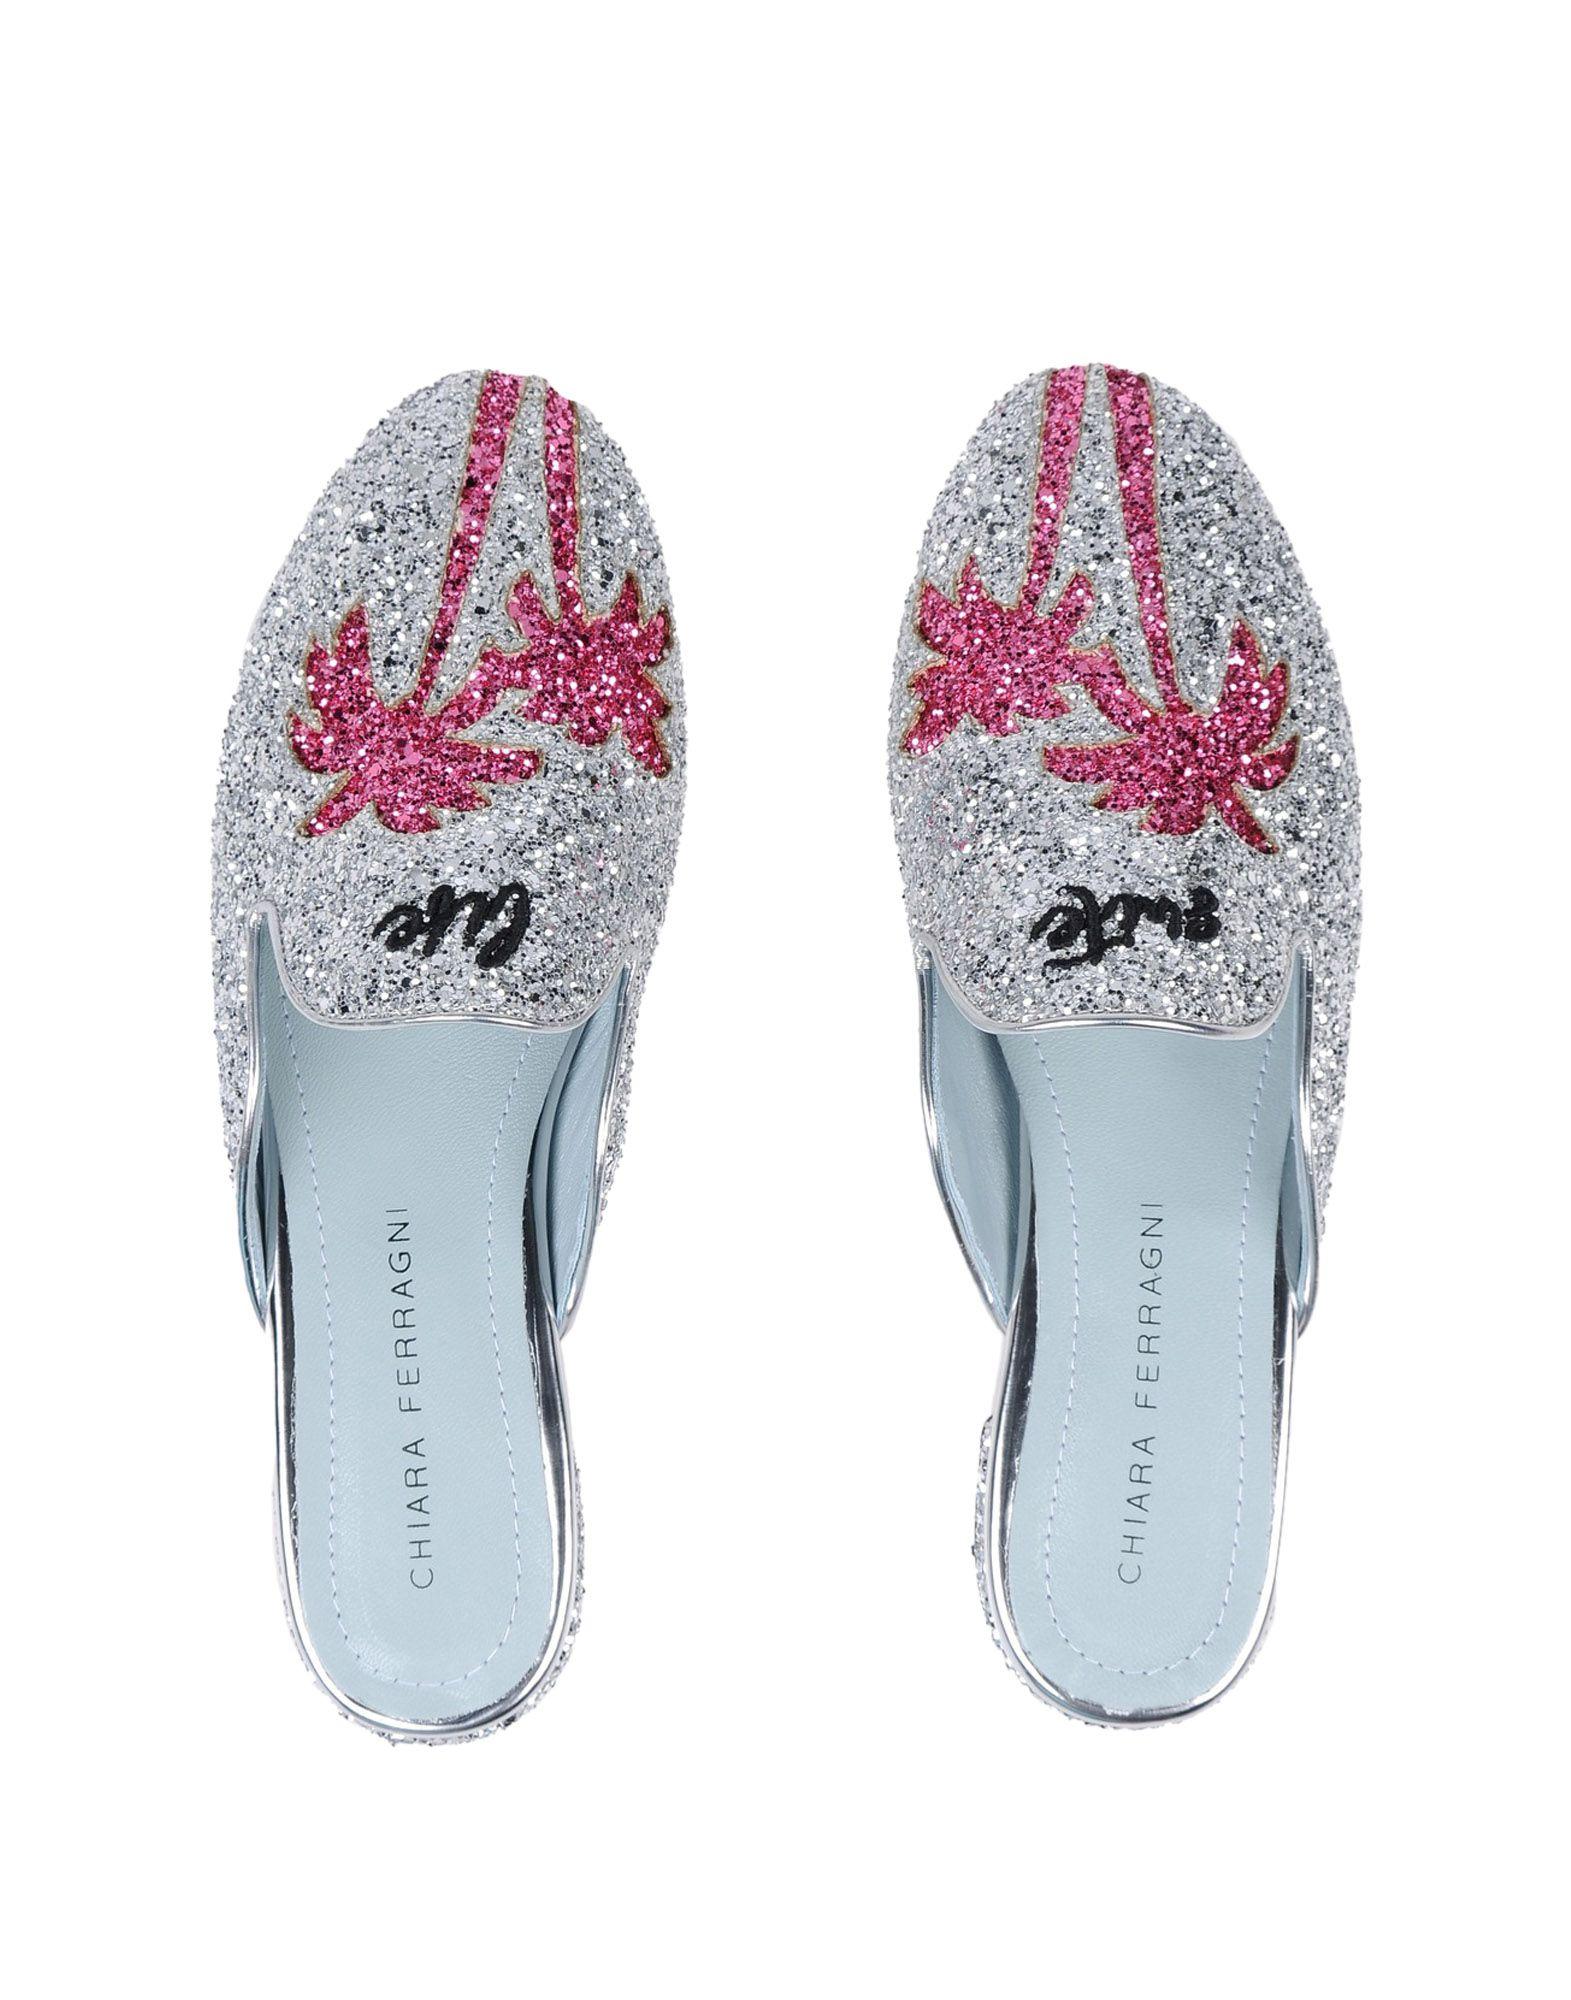 Chiara Ferragni Pantoletten Damen strapazierfähige  11531059ISGut aussehende strapazierfähige Damen Schuhe 473226